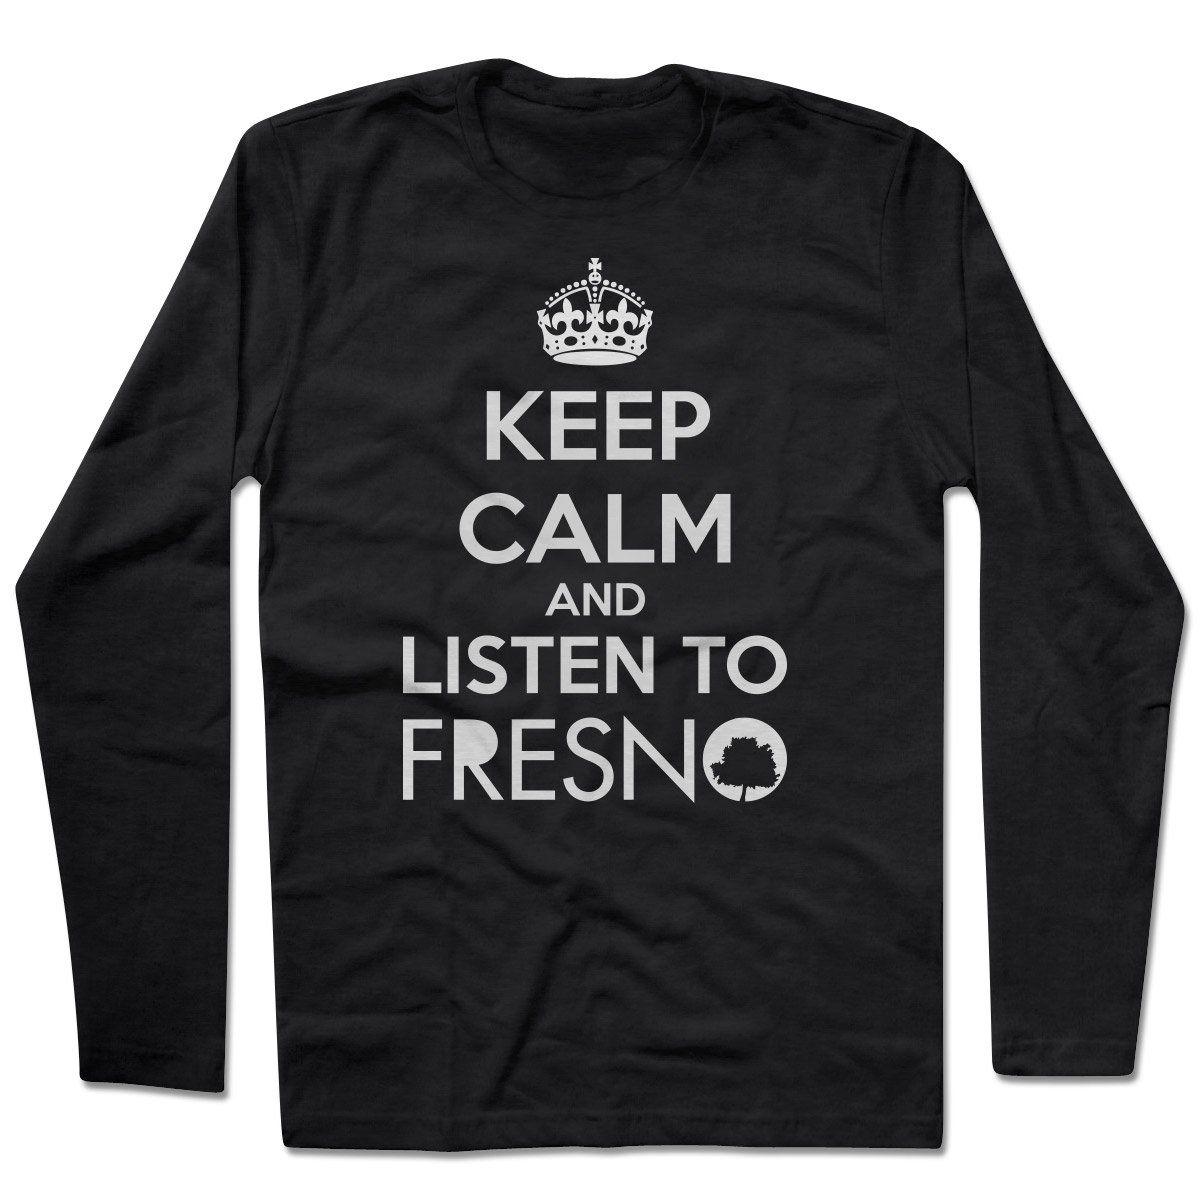 Camiseta Manga Longa Fresno - Keep Calm Black